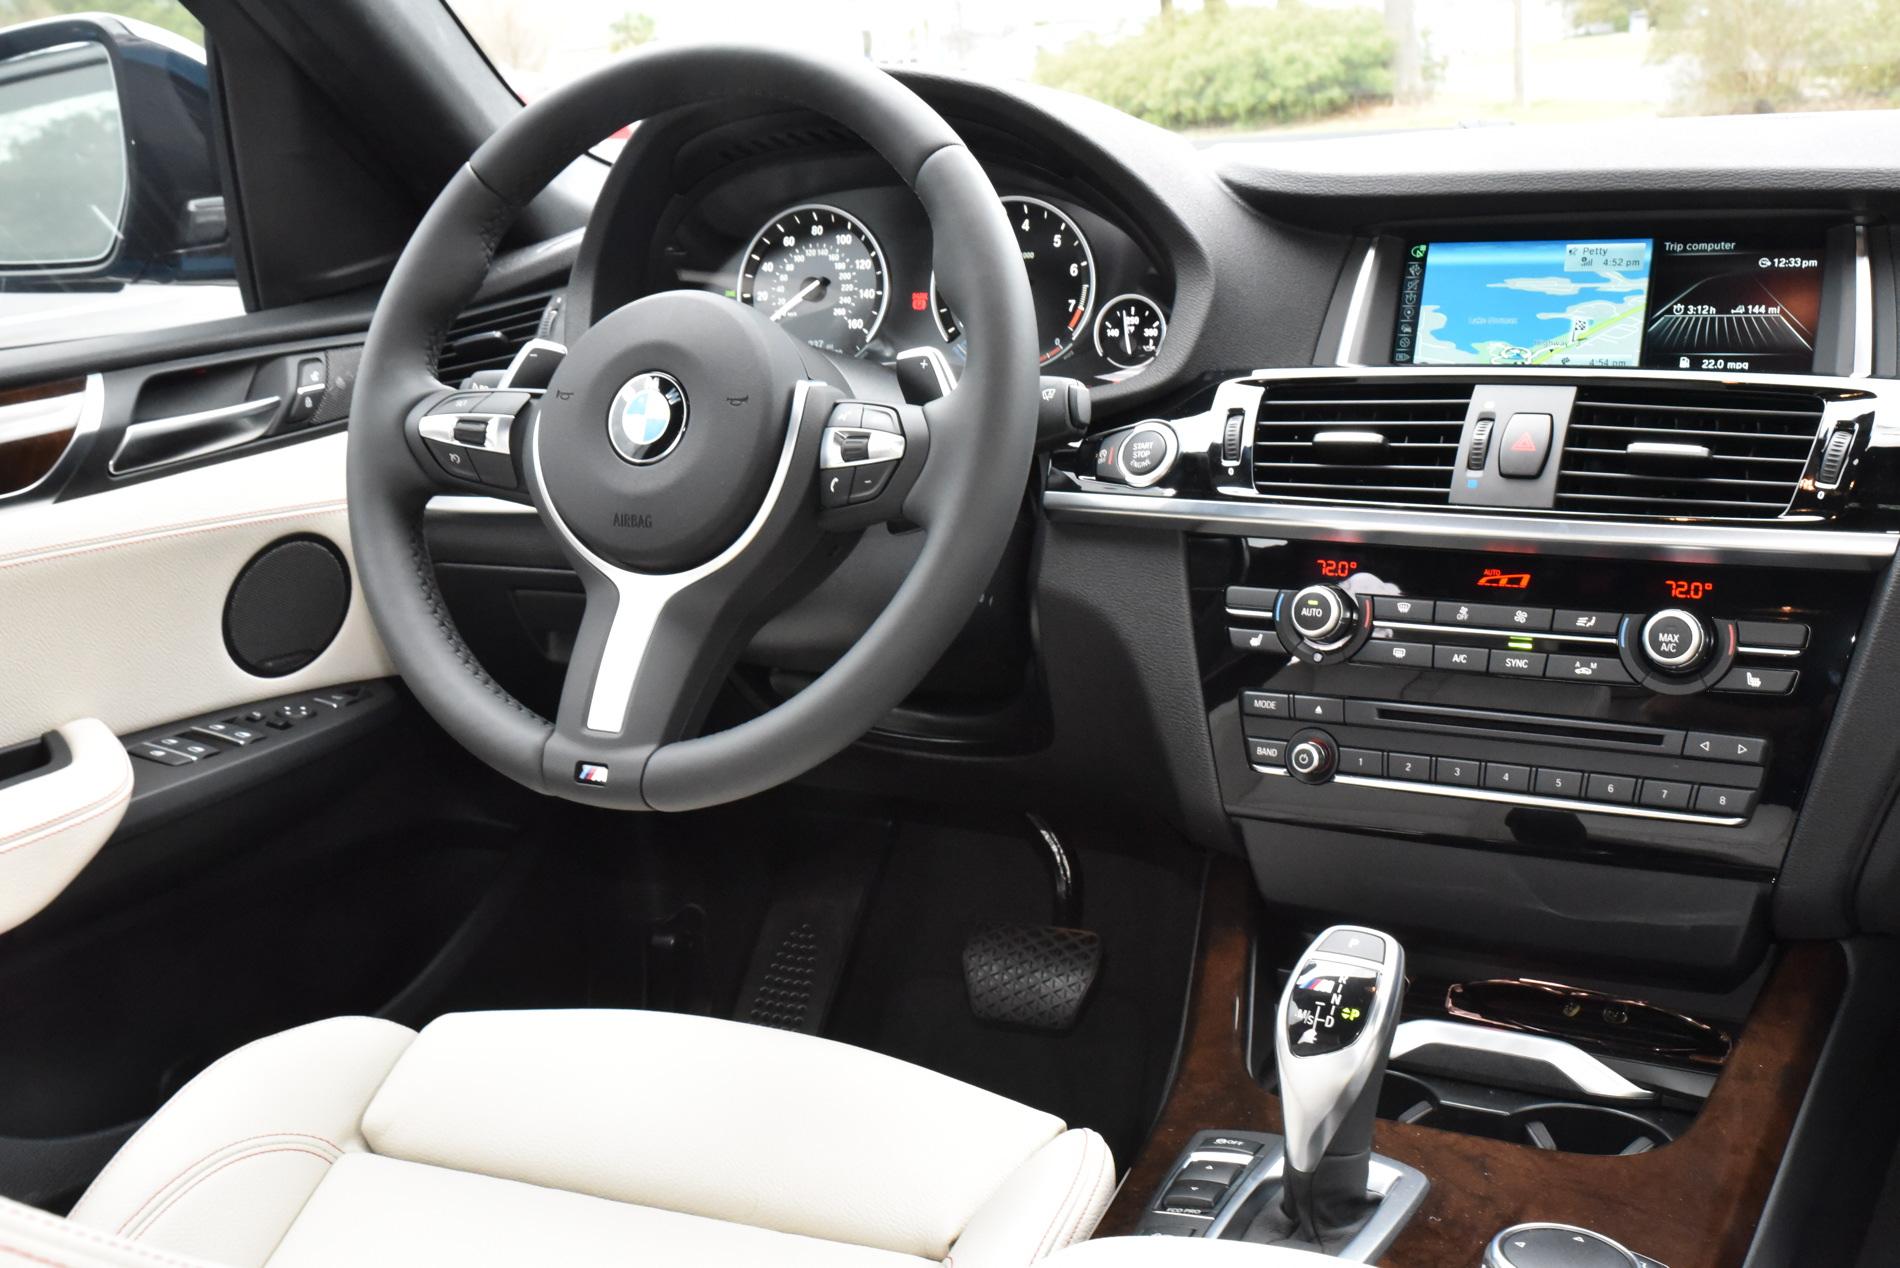 2016 BMW X4 M40i Long Beach Blue Drive 8